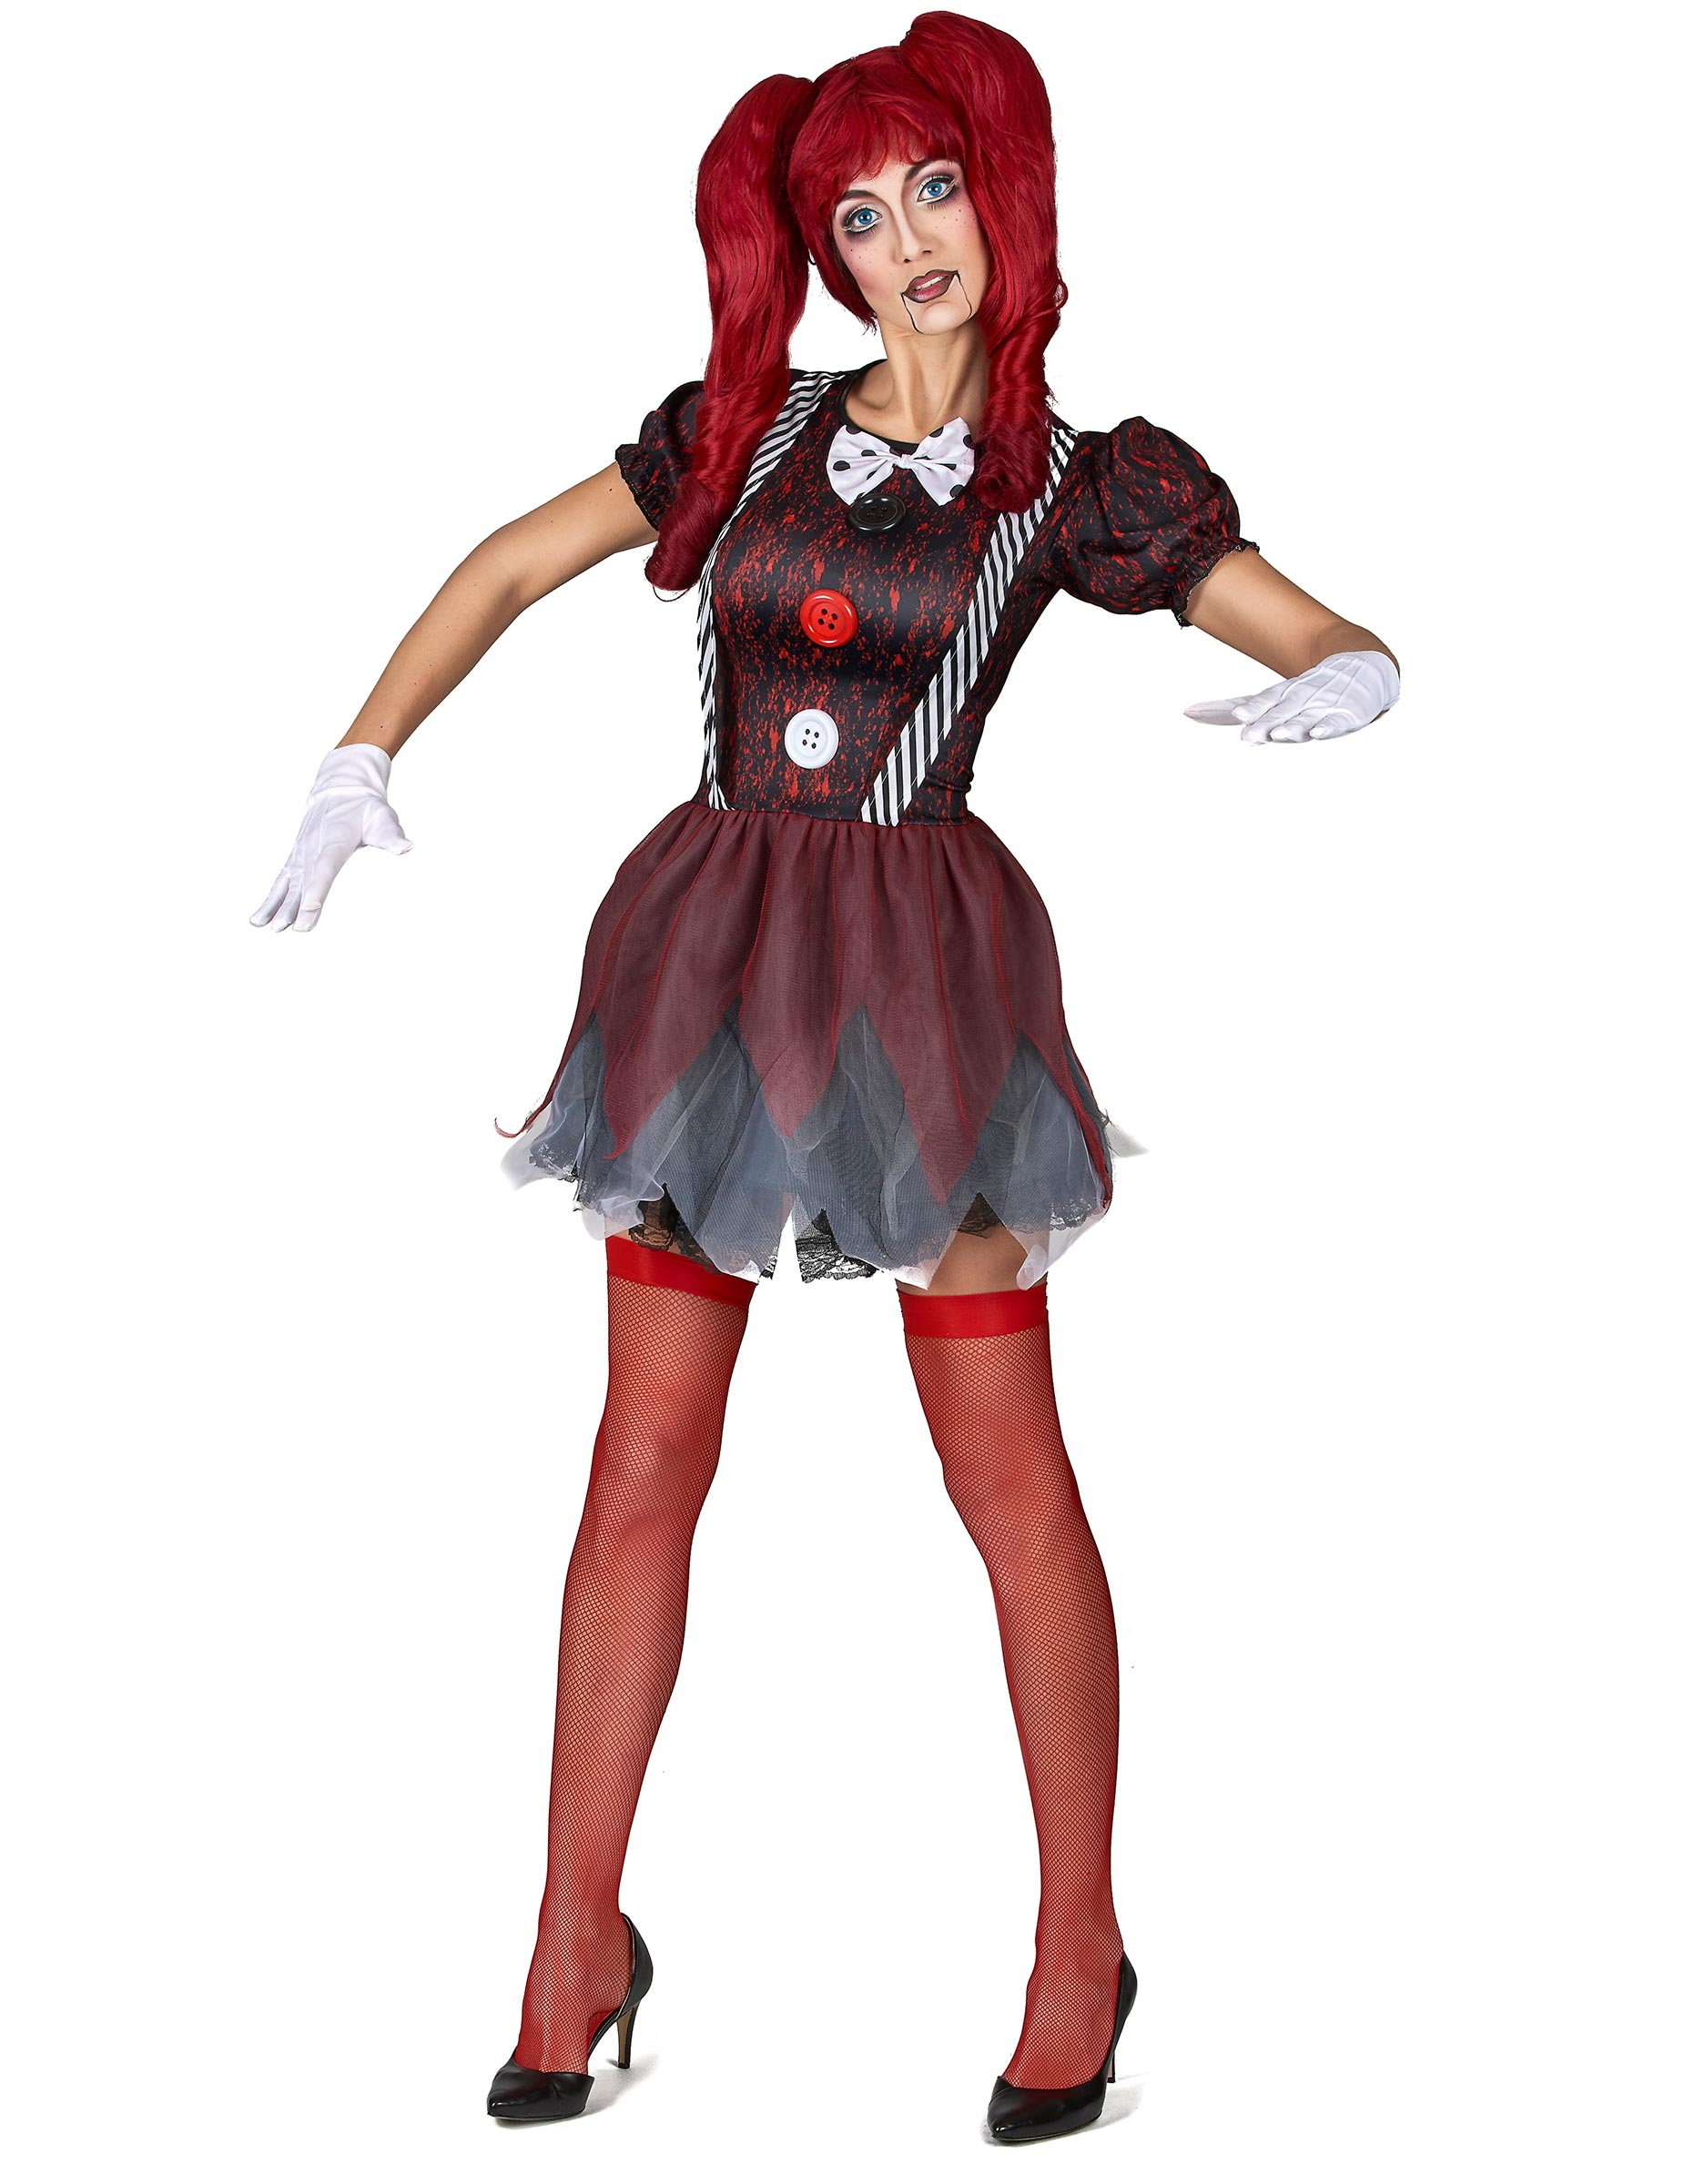 horror puppe damen kost m rot schwarz weiss g nstige faschings kost me bei karneval megastore. Black Bedroom Furniture Sets. Home Design Ideas